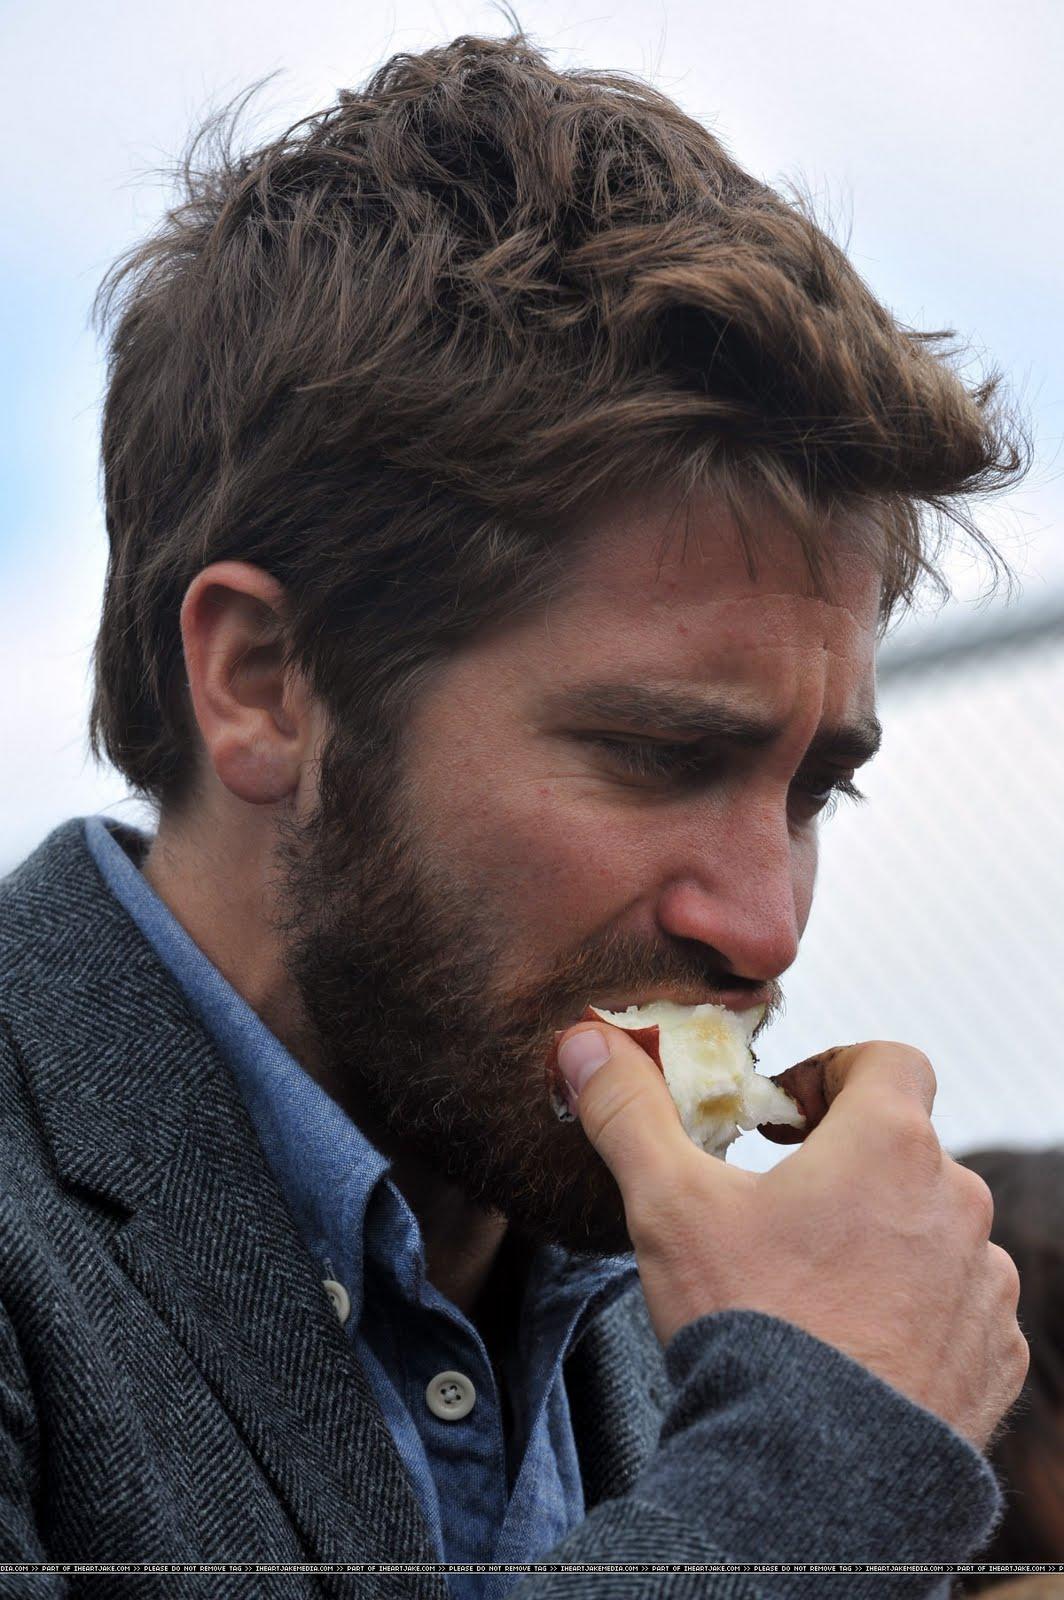 Kirsten Dunst And Jake Gyllenhaal Eating WEIRDLAND: Searc...